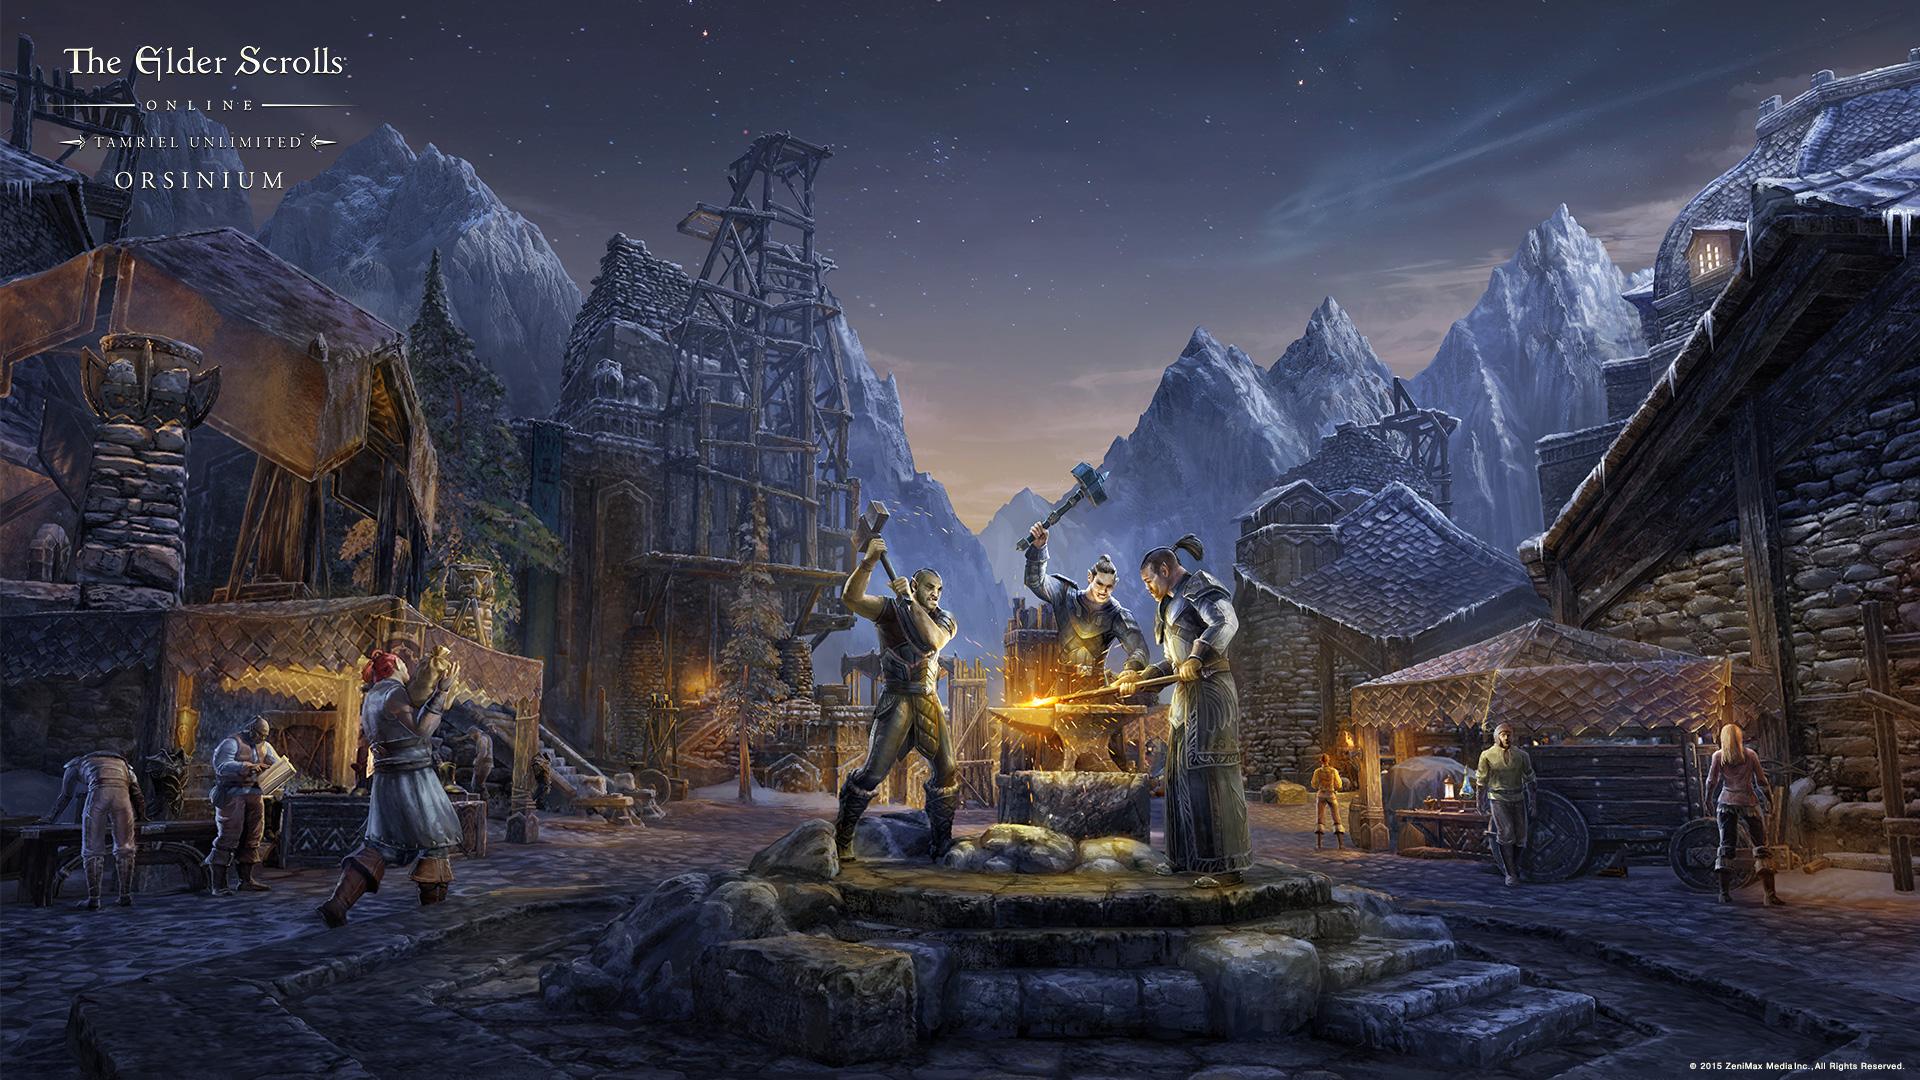 World Of Warcraft Wallpapers Hd The Elder Scrolls Online Concept Art Ruin Gaming